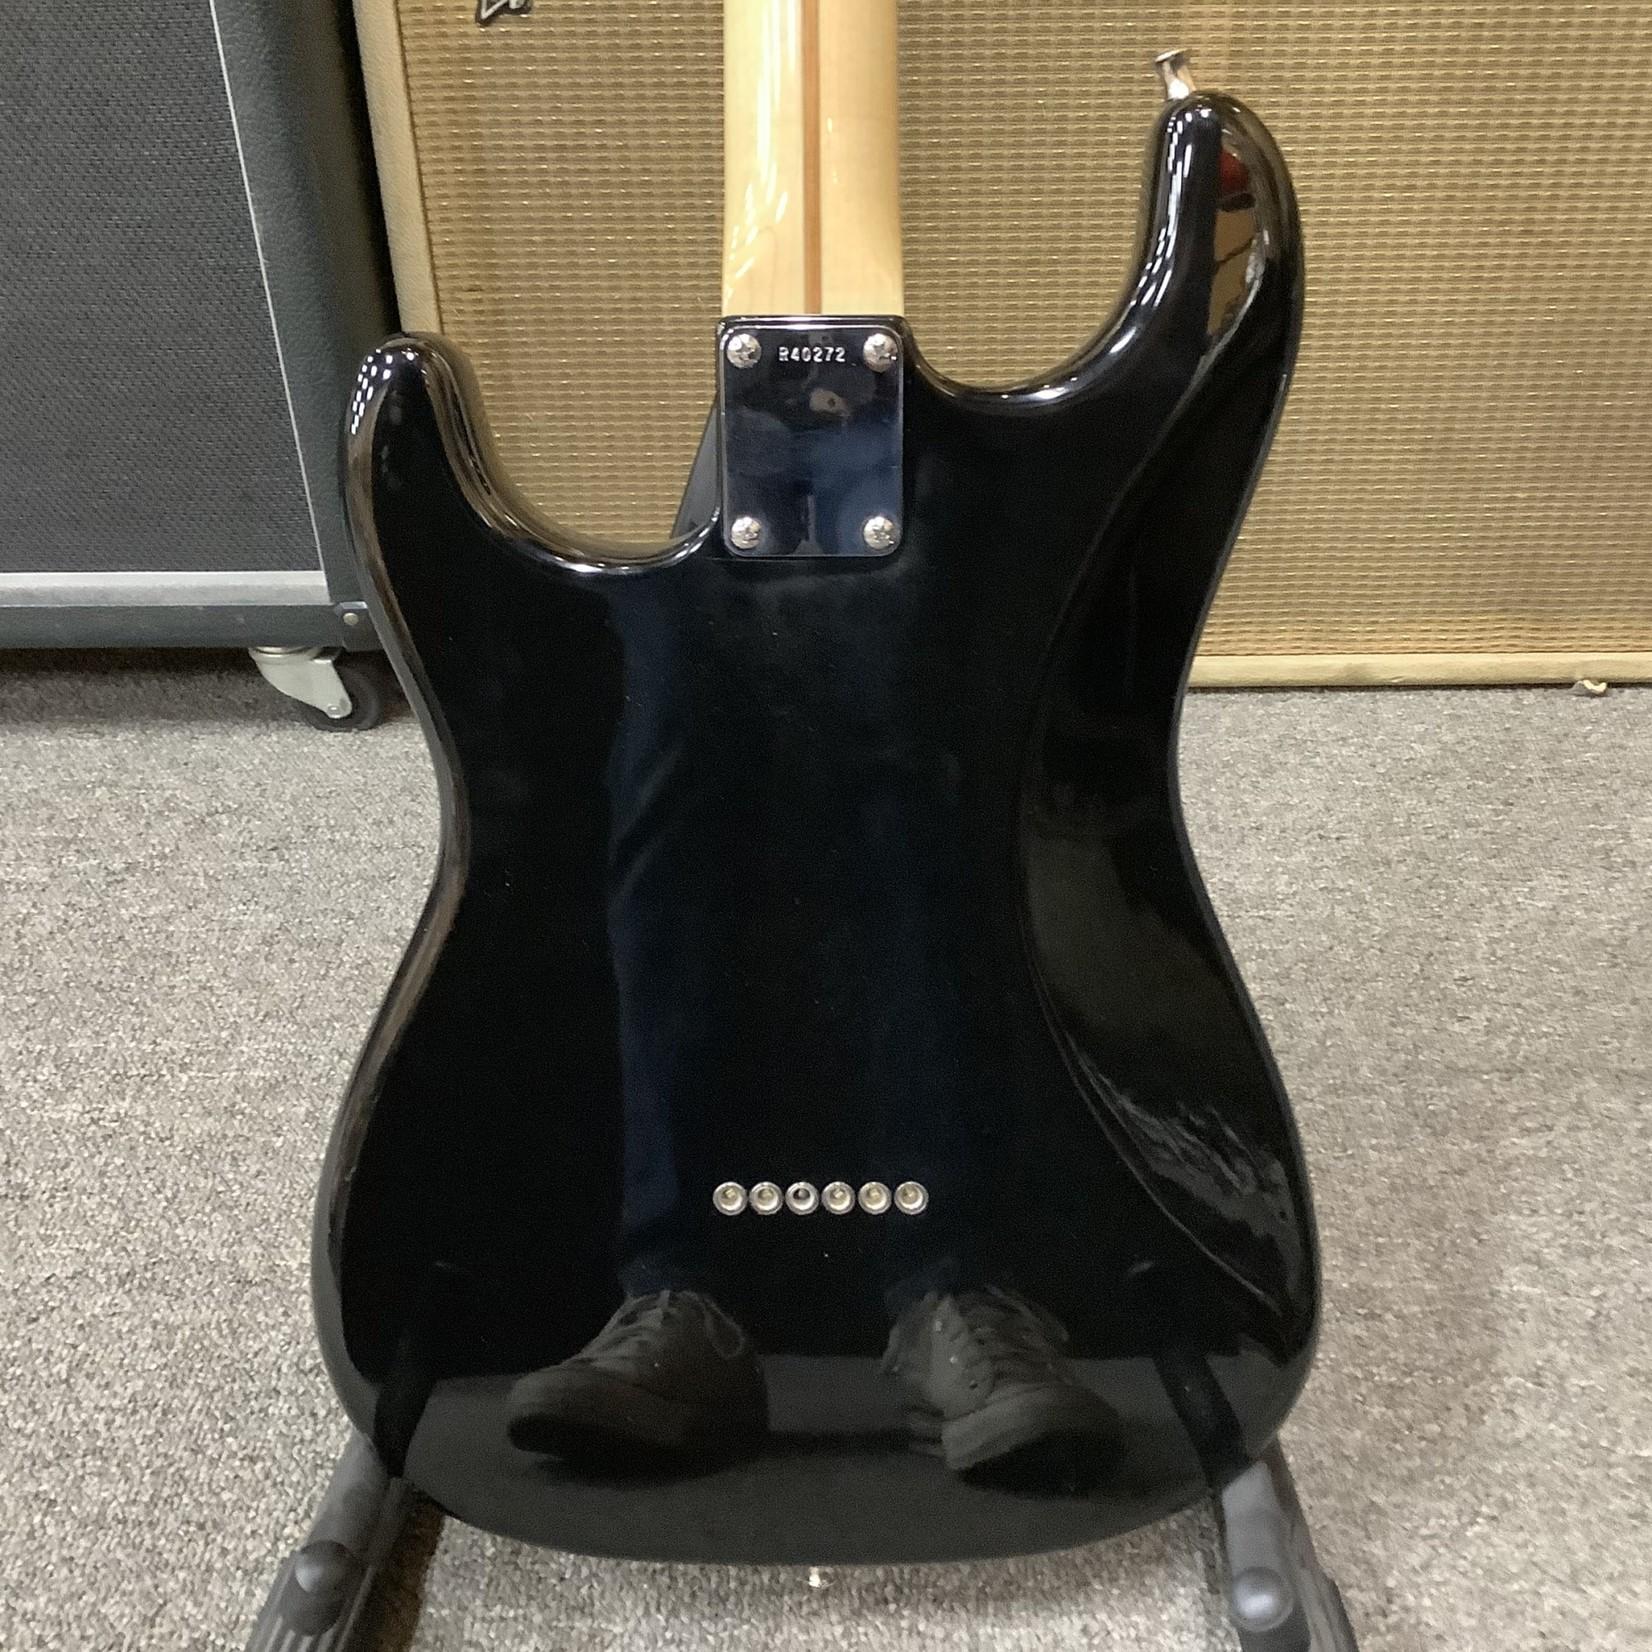 Fender Fender Custom Shop NOS 1957 Stratocaster Hardtail